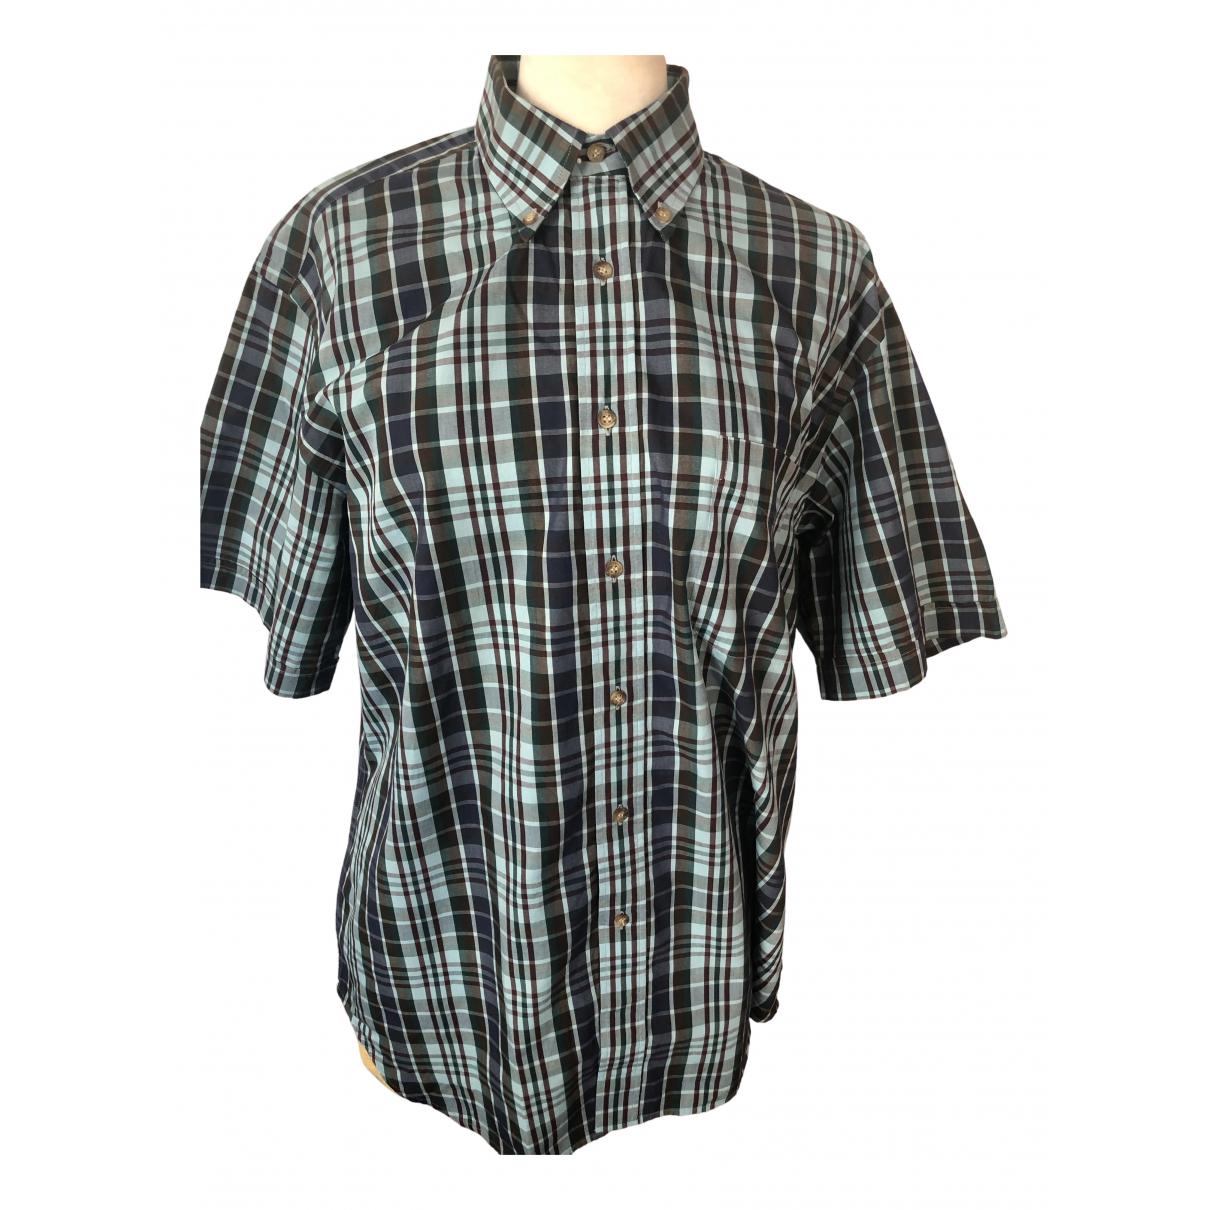 Burberry \N Blue Cotton Shirts for Men 41 EU (tour de cou / collar)